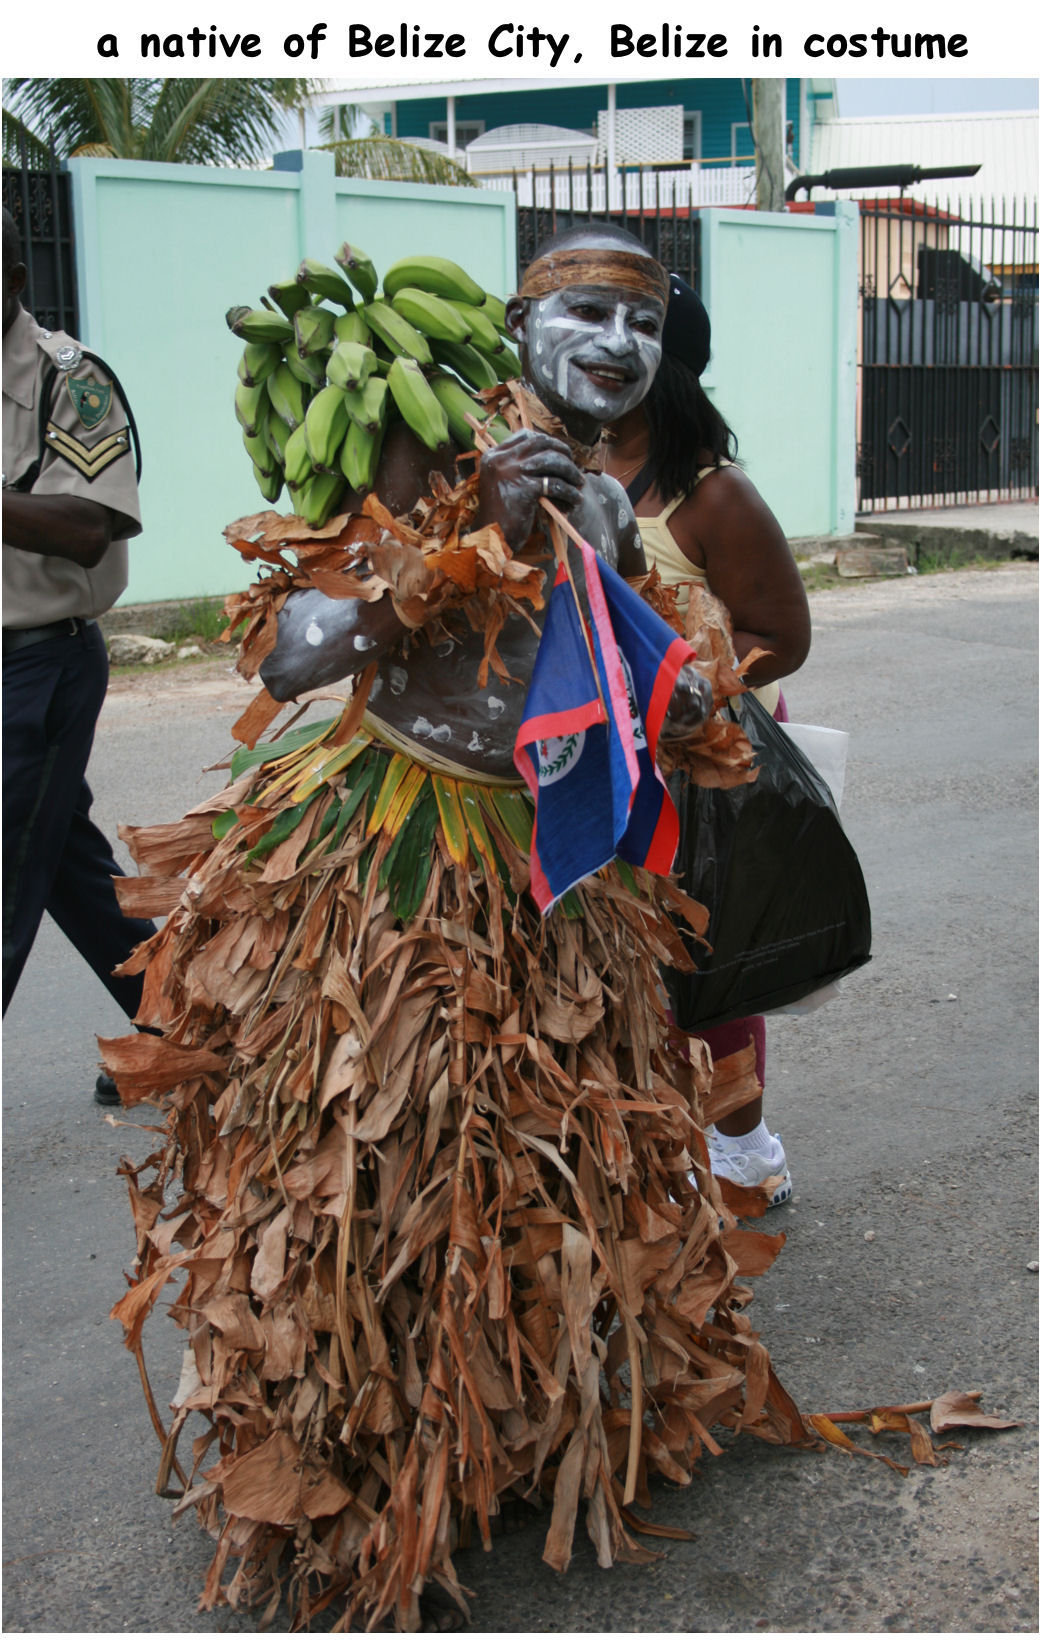 Belize - native costume